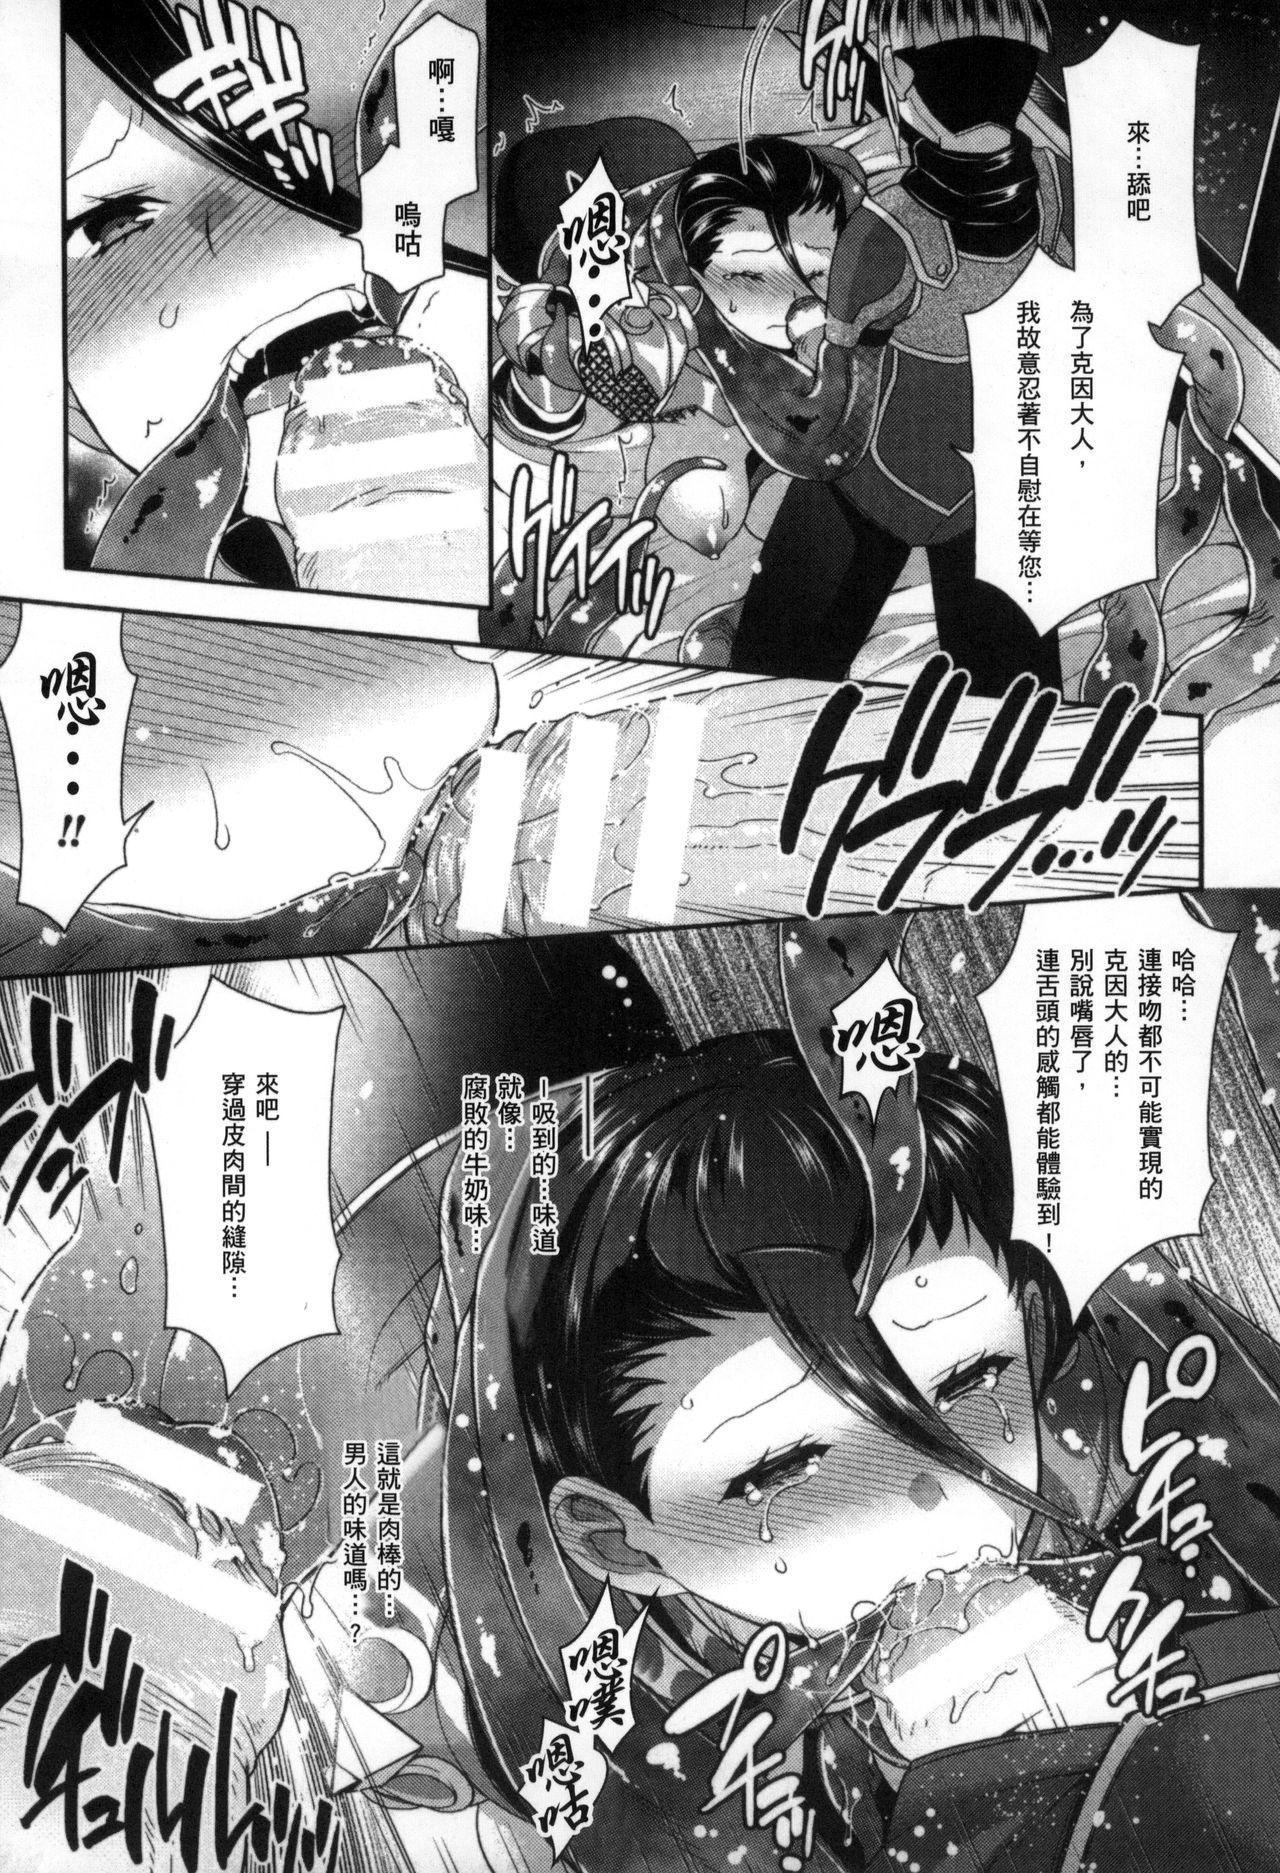 2D Comic Magazine Seitenkan Shite Haramasarete Botebara End! | 性轉換與懷孕,滿腹精液收場! 13